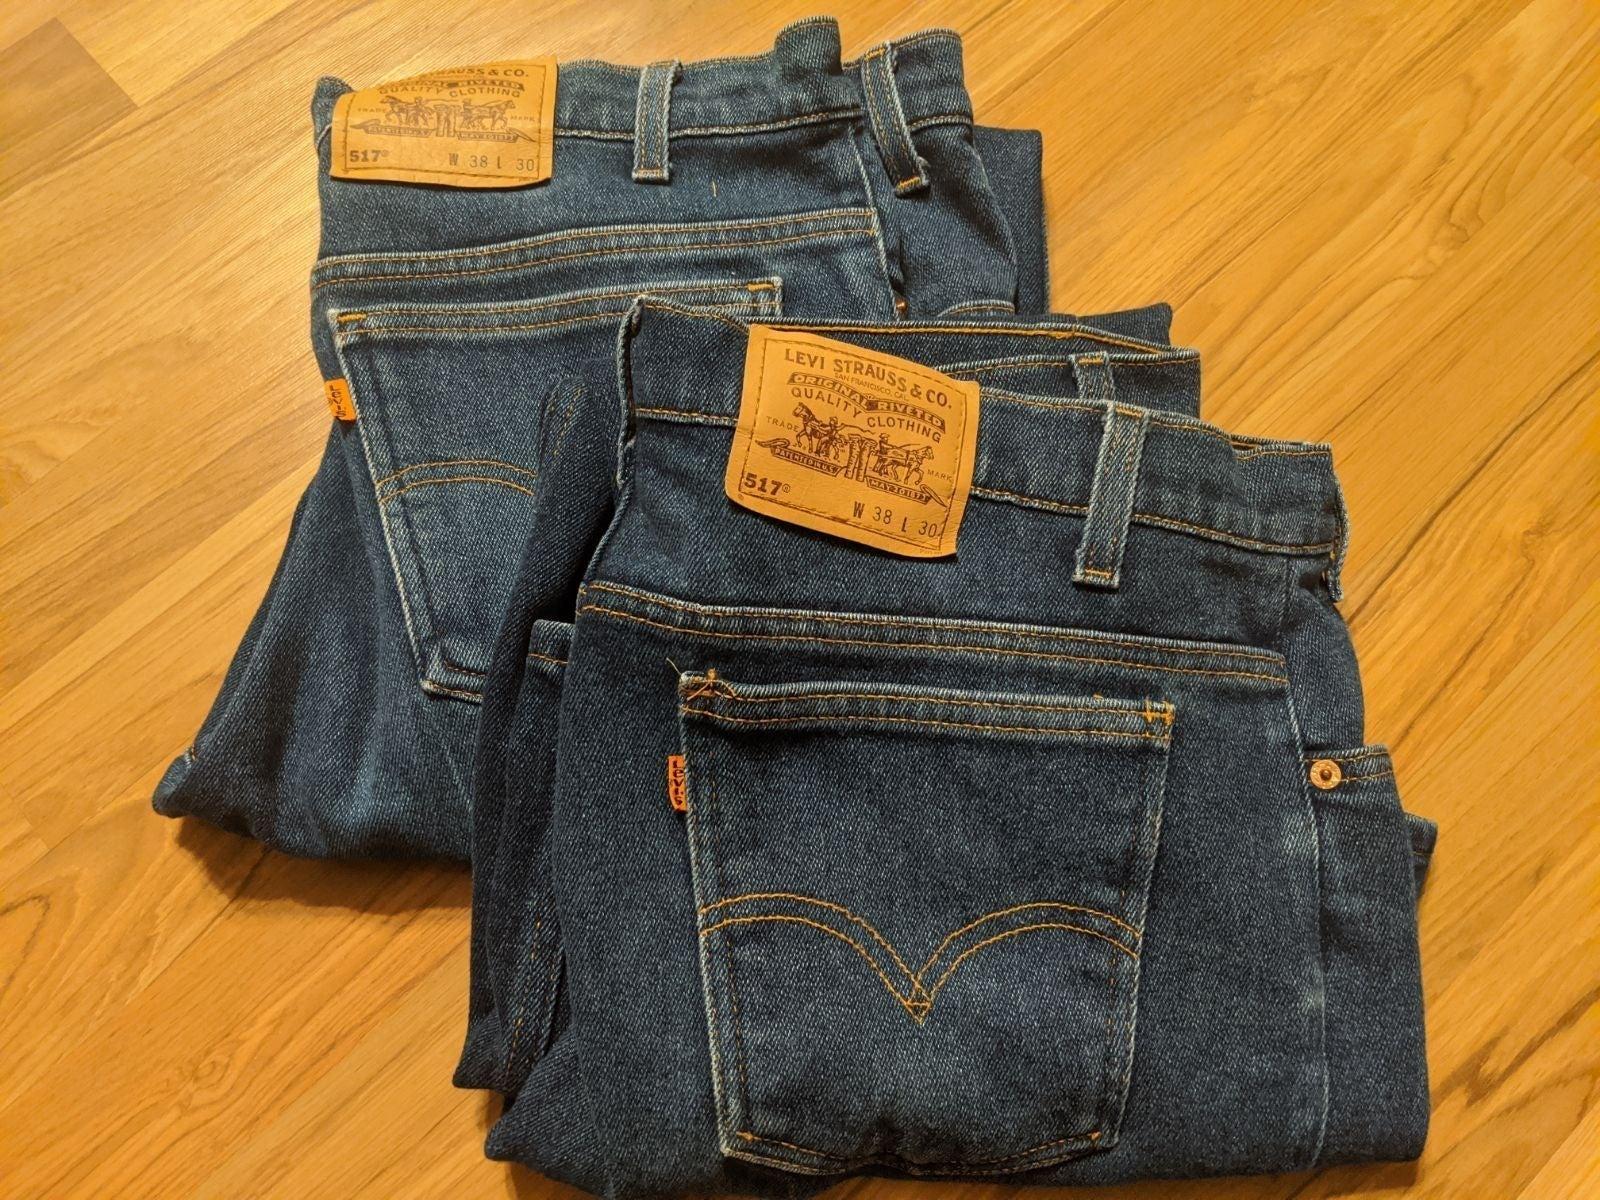 Levi jeans 517 lot of 2, 38x30